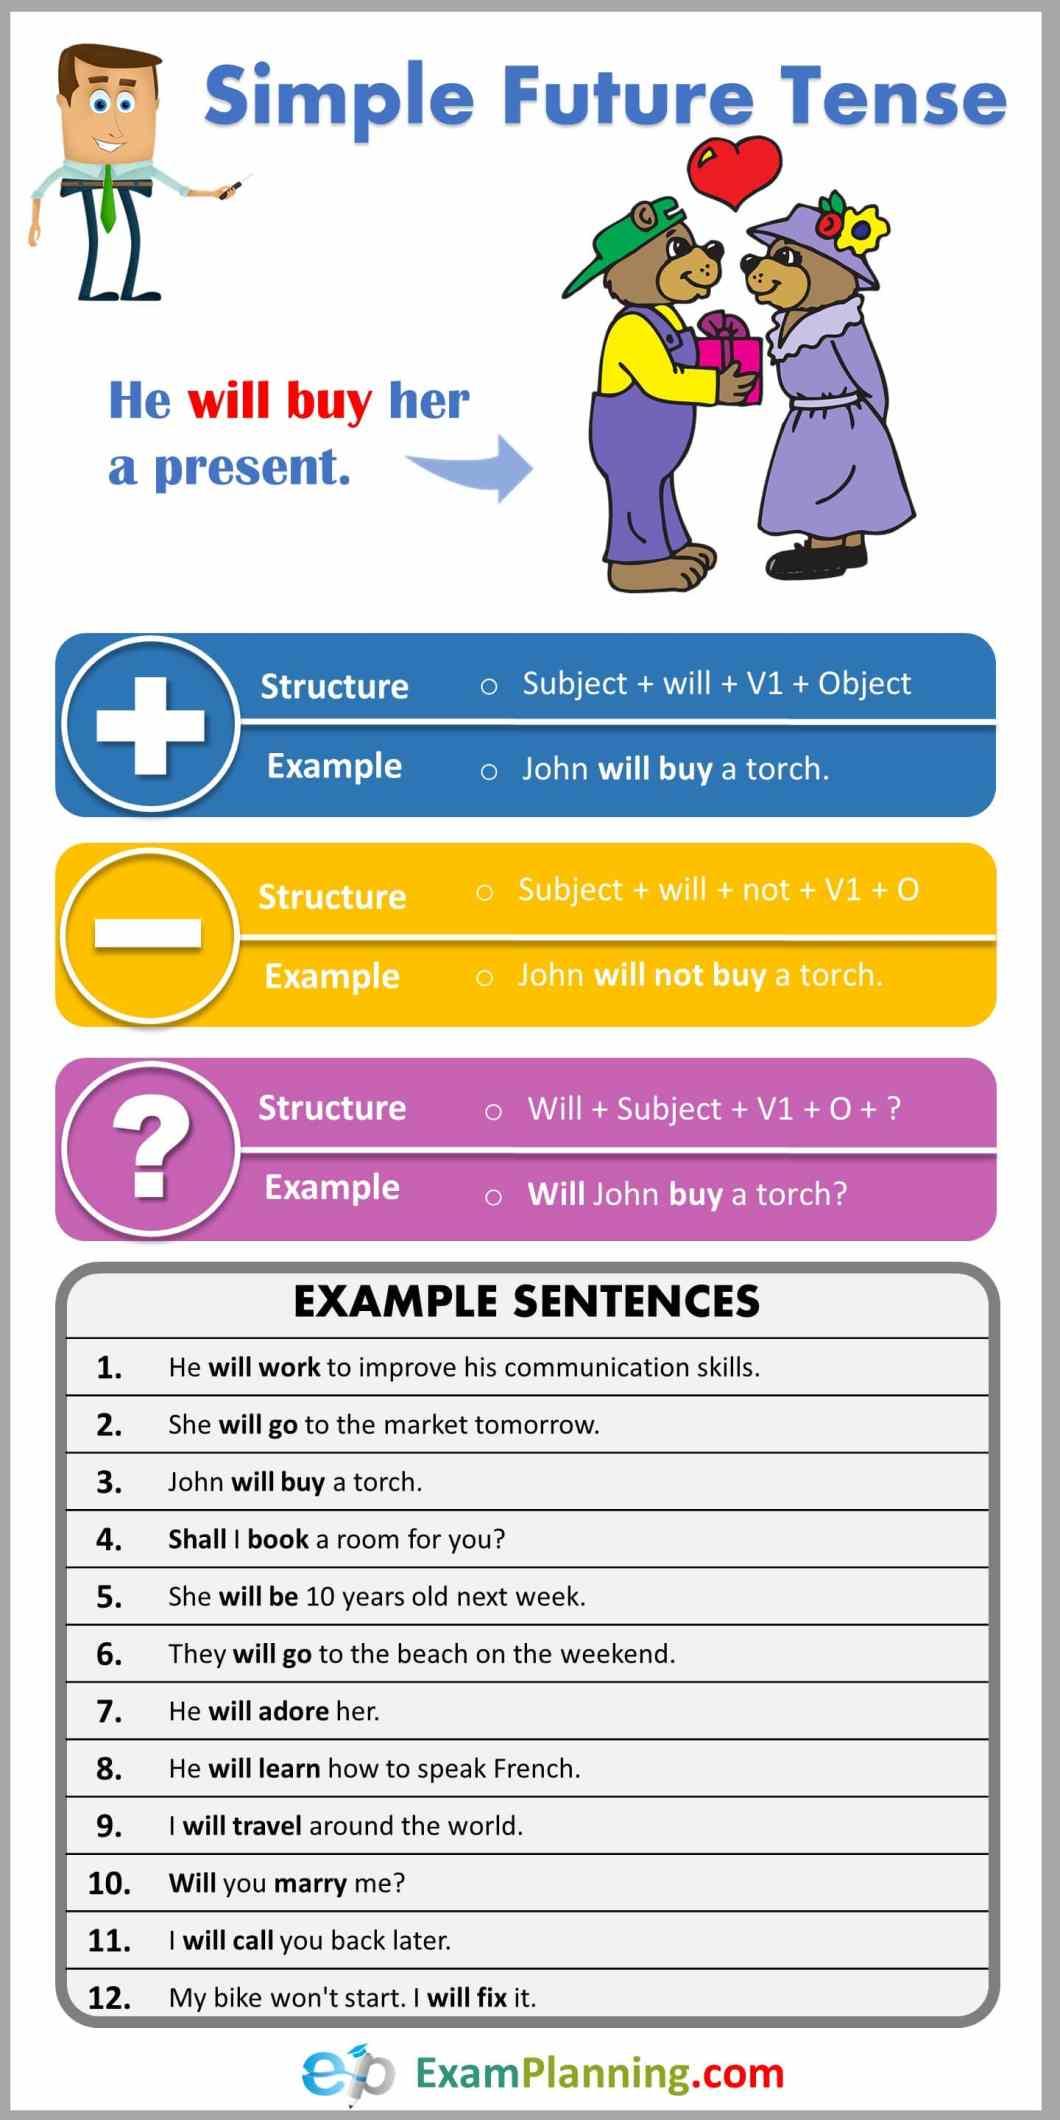 Simple Future Tense (Formula, Usage & Examples)